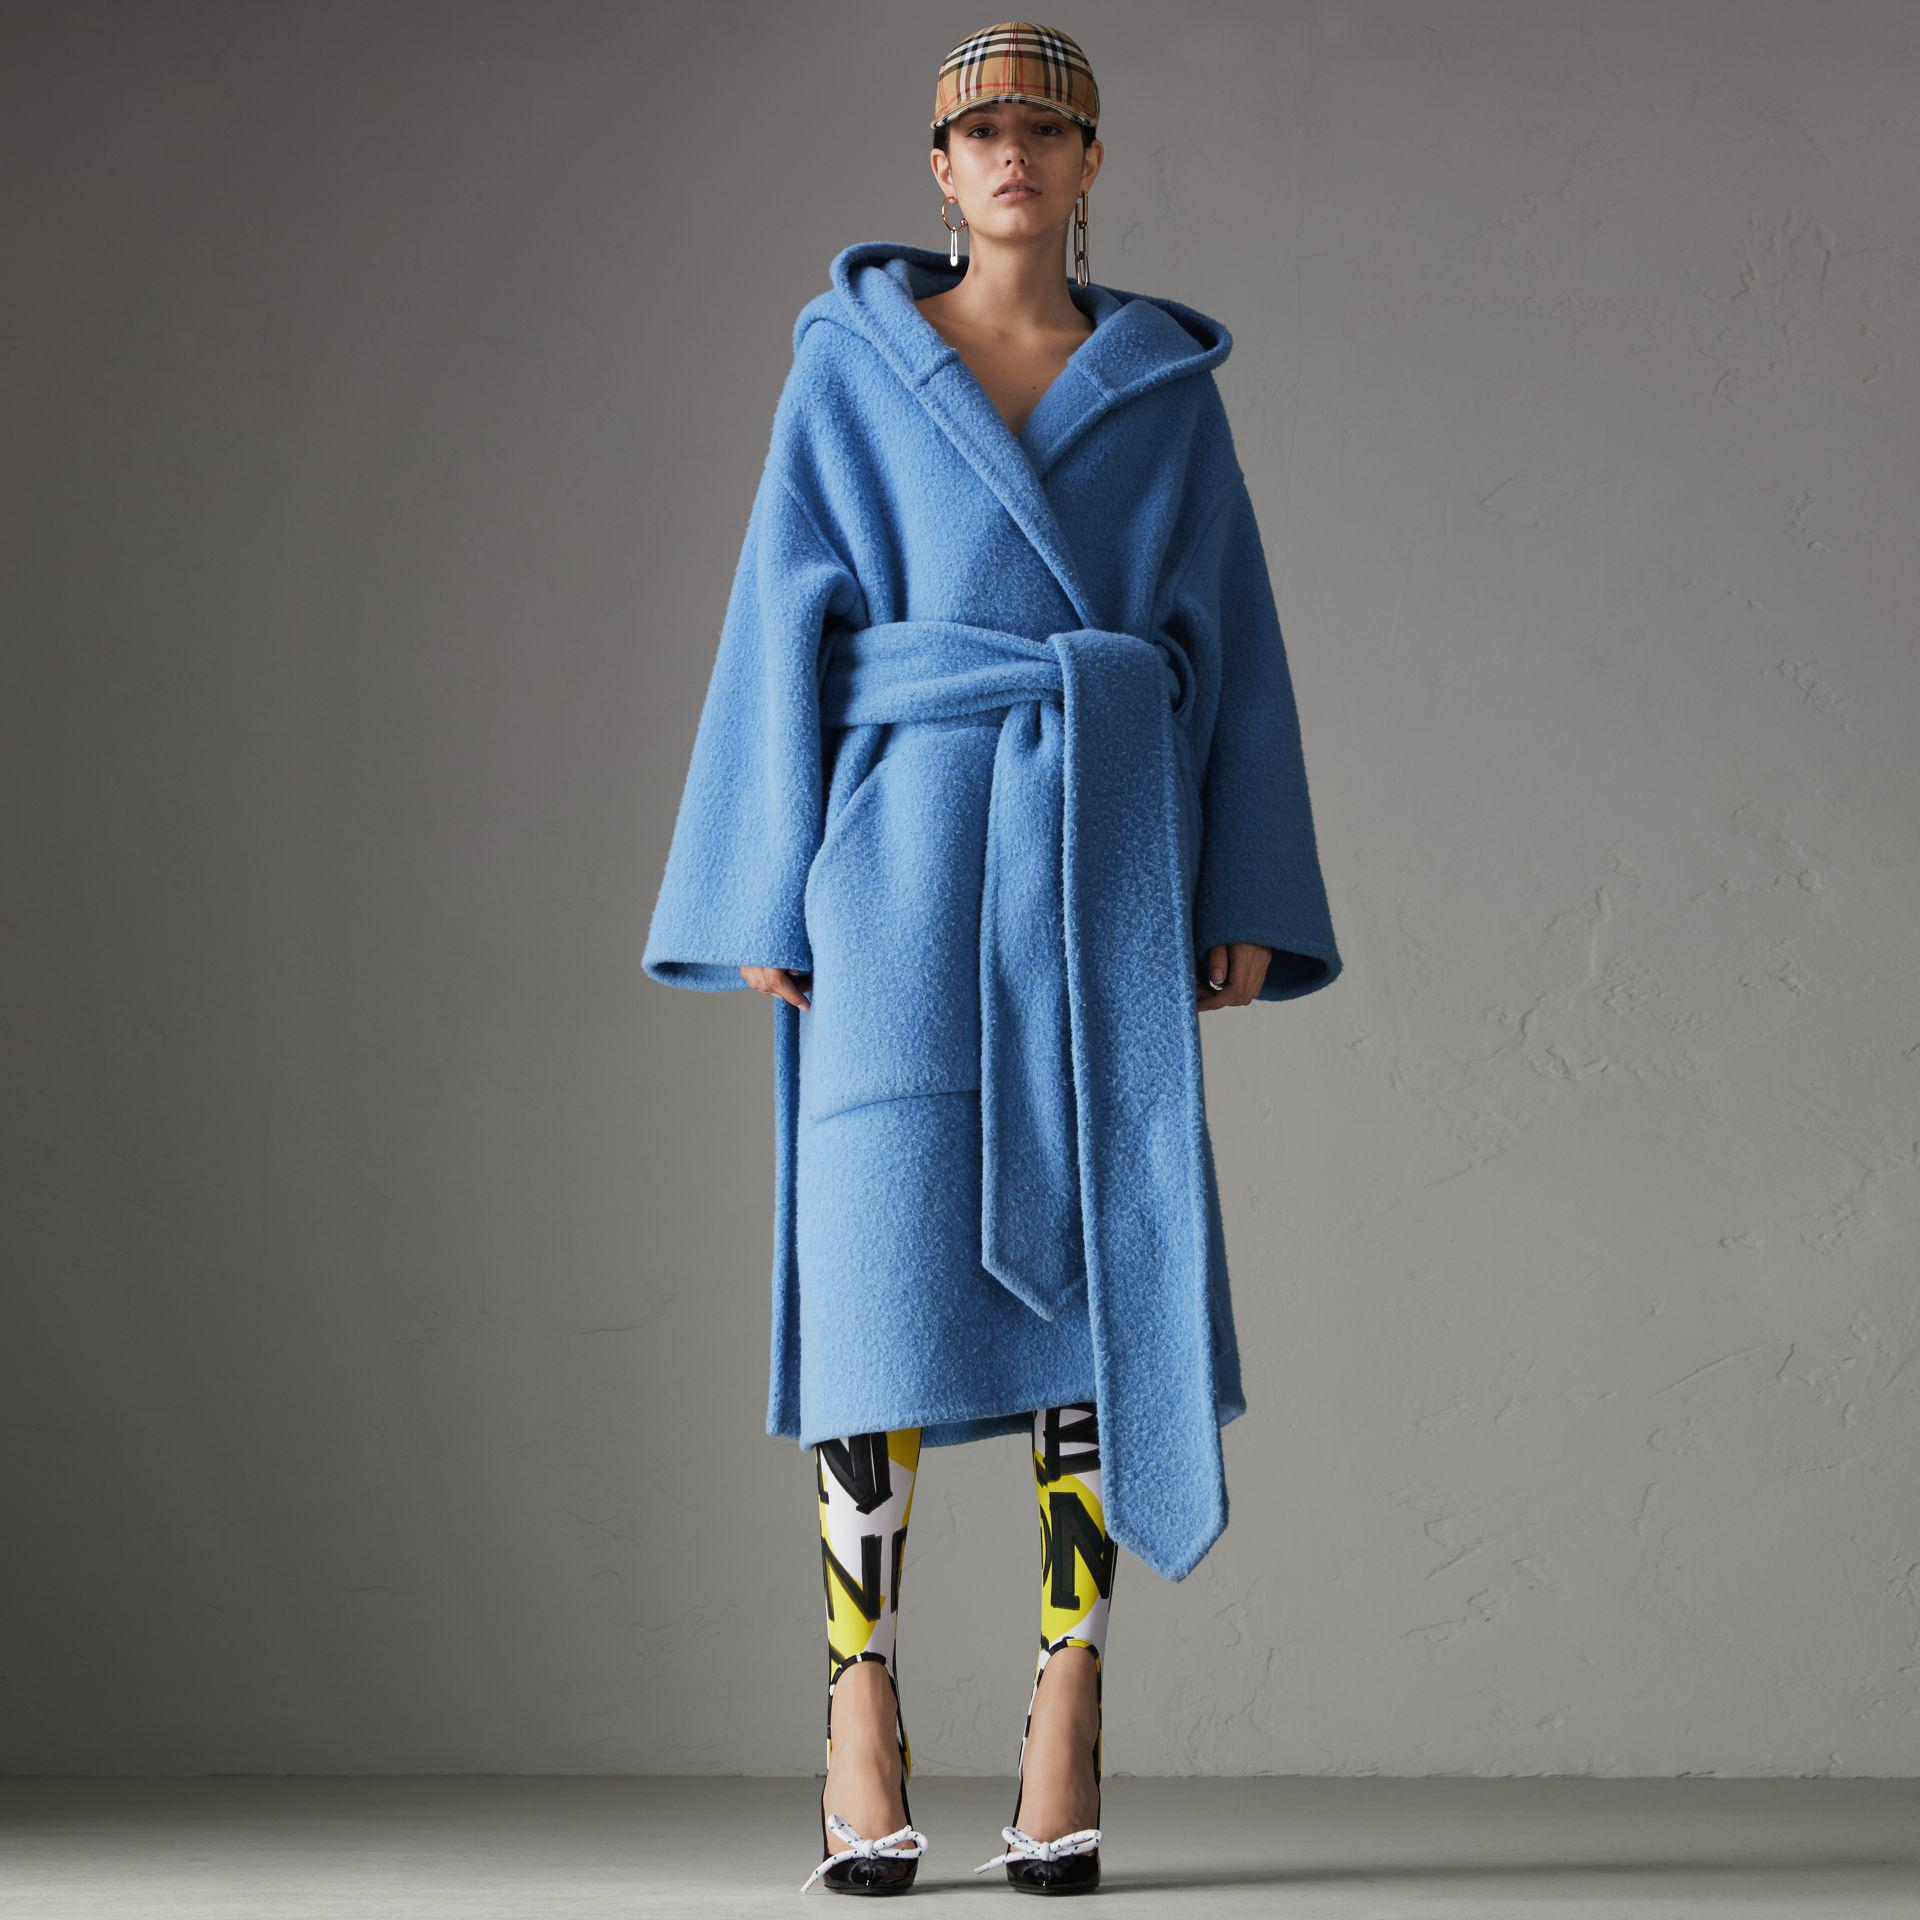 63f4c33471 Lyst - Burberry Alpaca Wool Blend Dressing Gown Coat in Blue